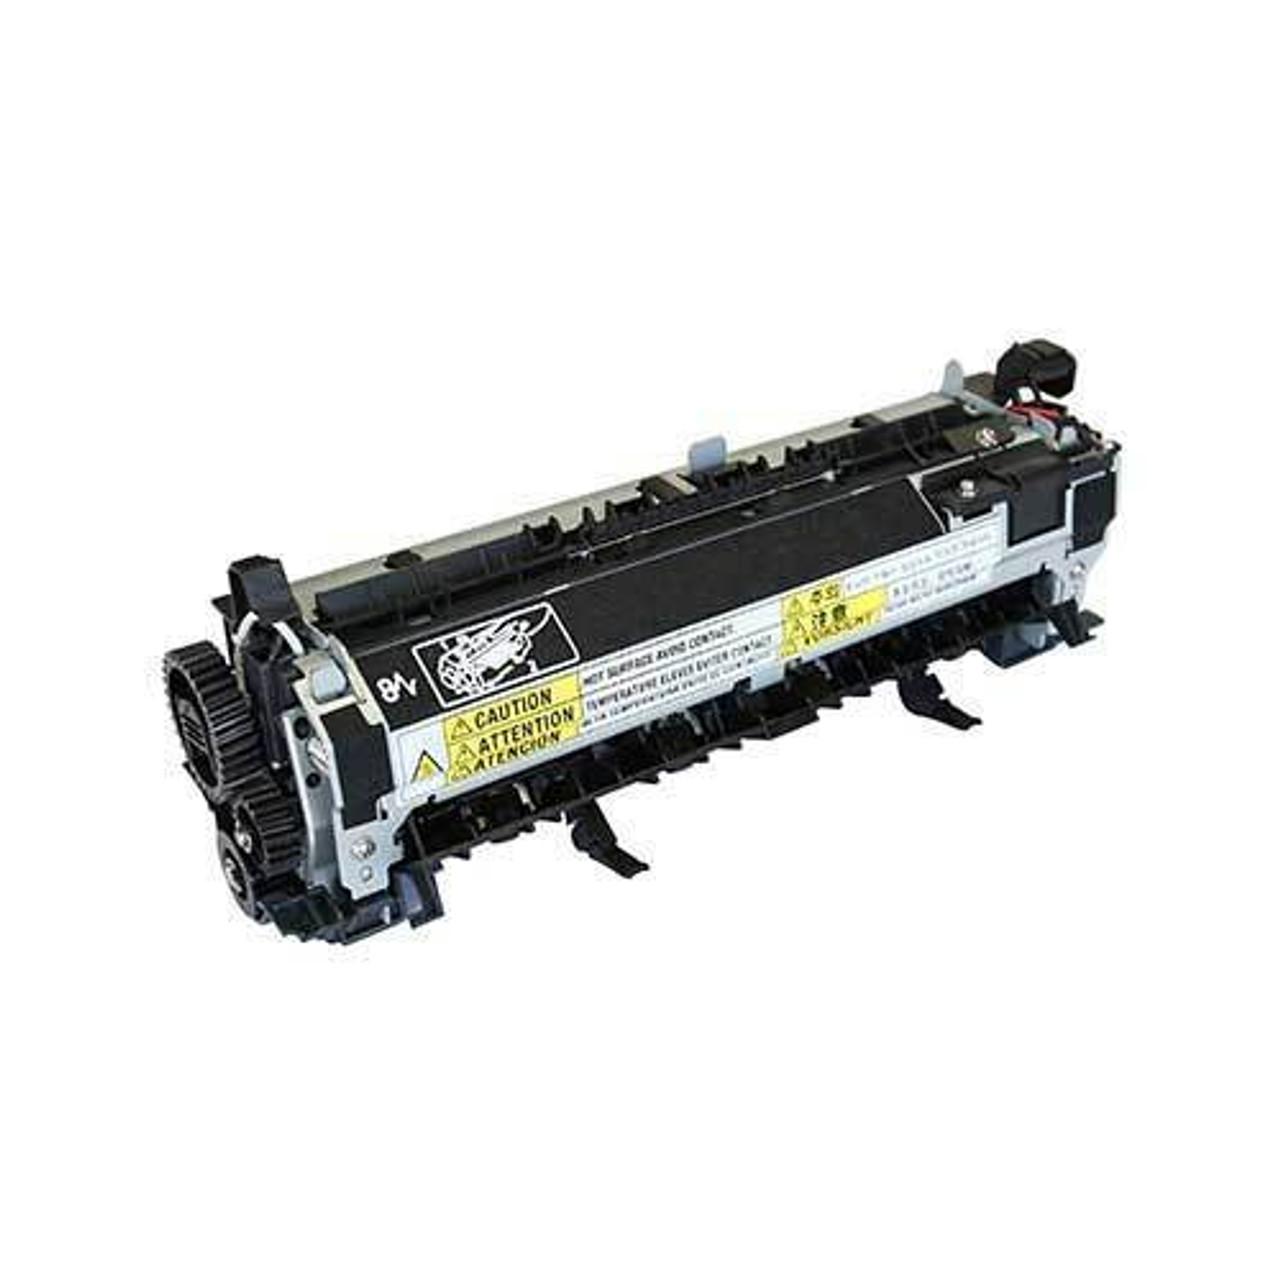 HP LaserJet M601 Fuser/ M602 Fuser / M603 Fuser - RM1-8395